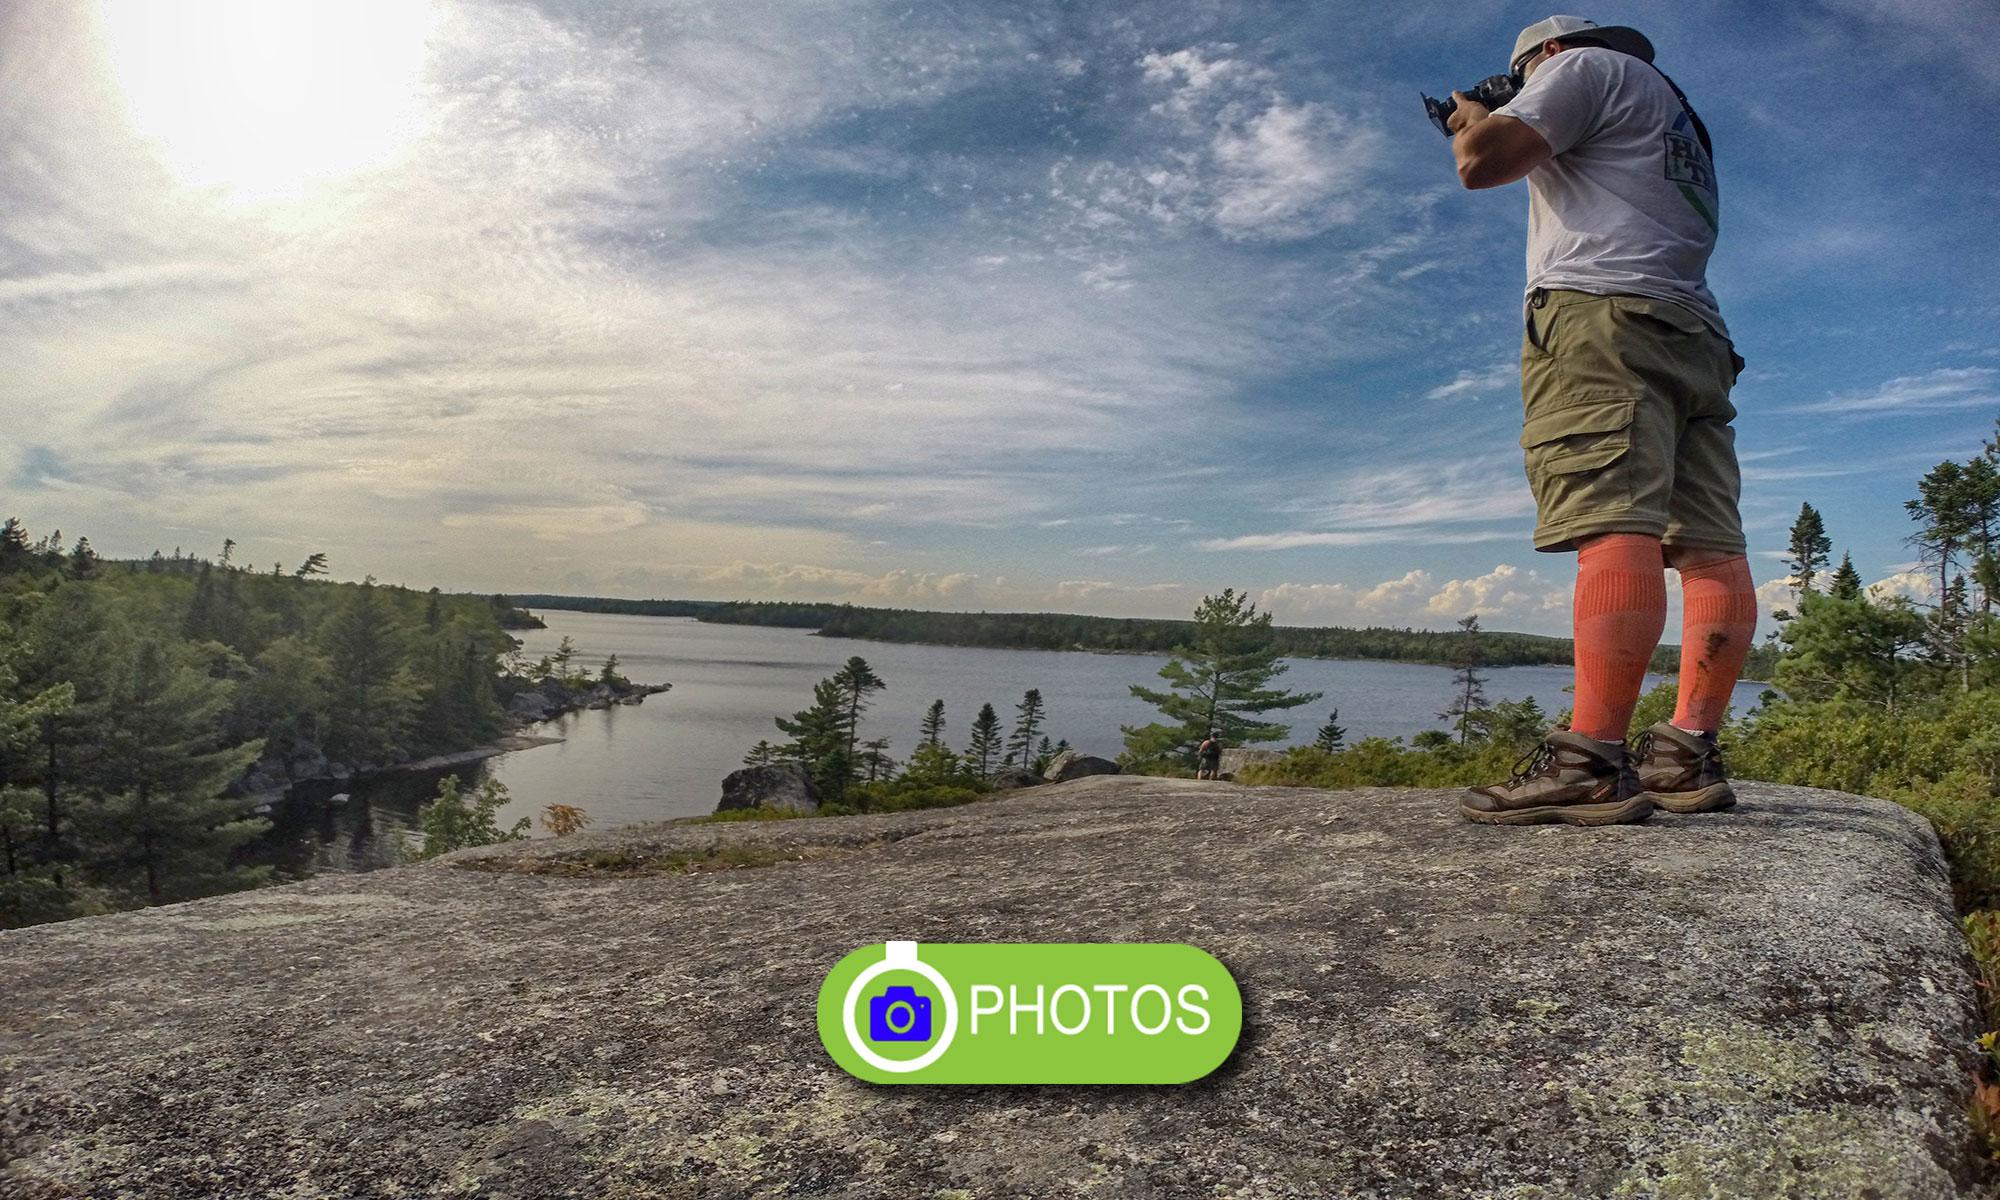 Halifax Trails Photos